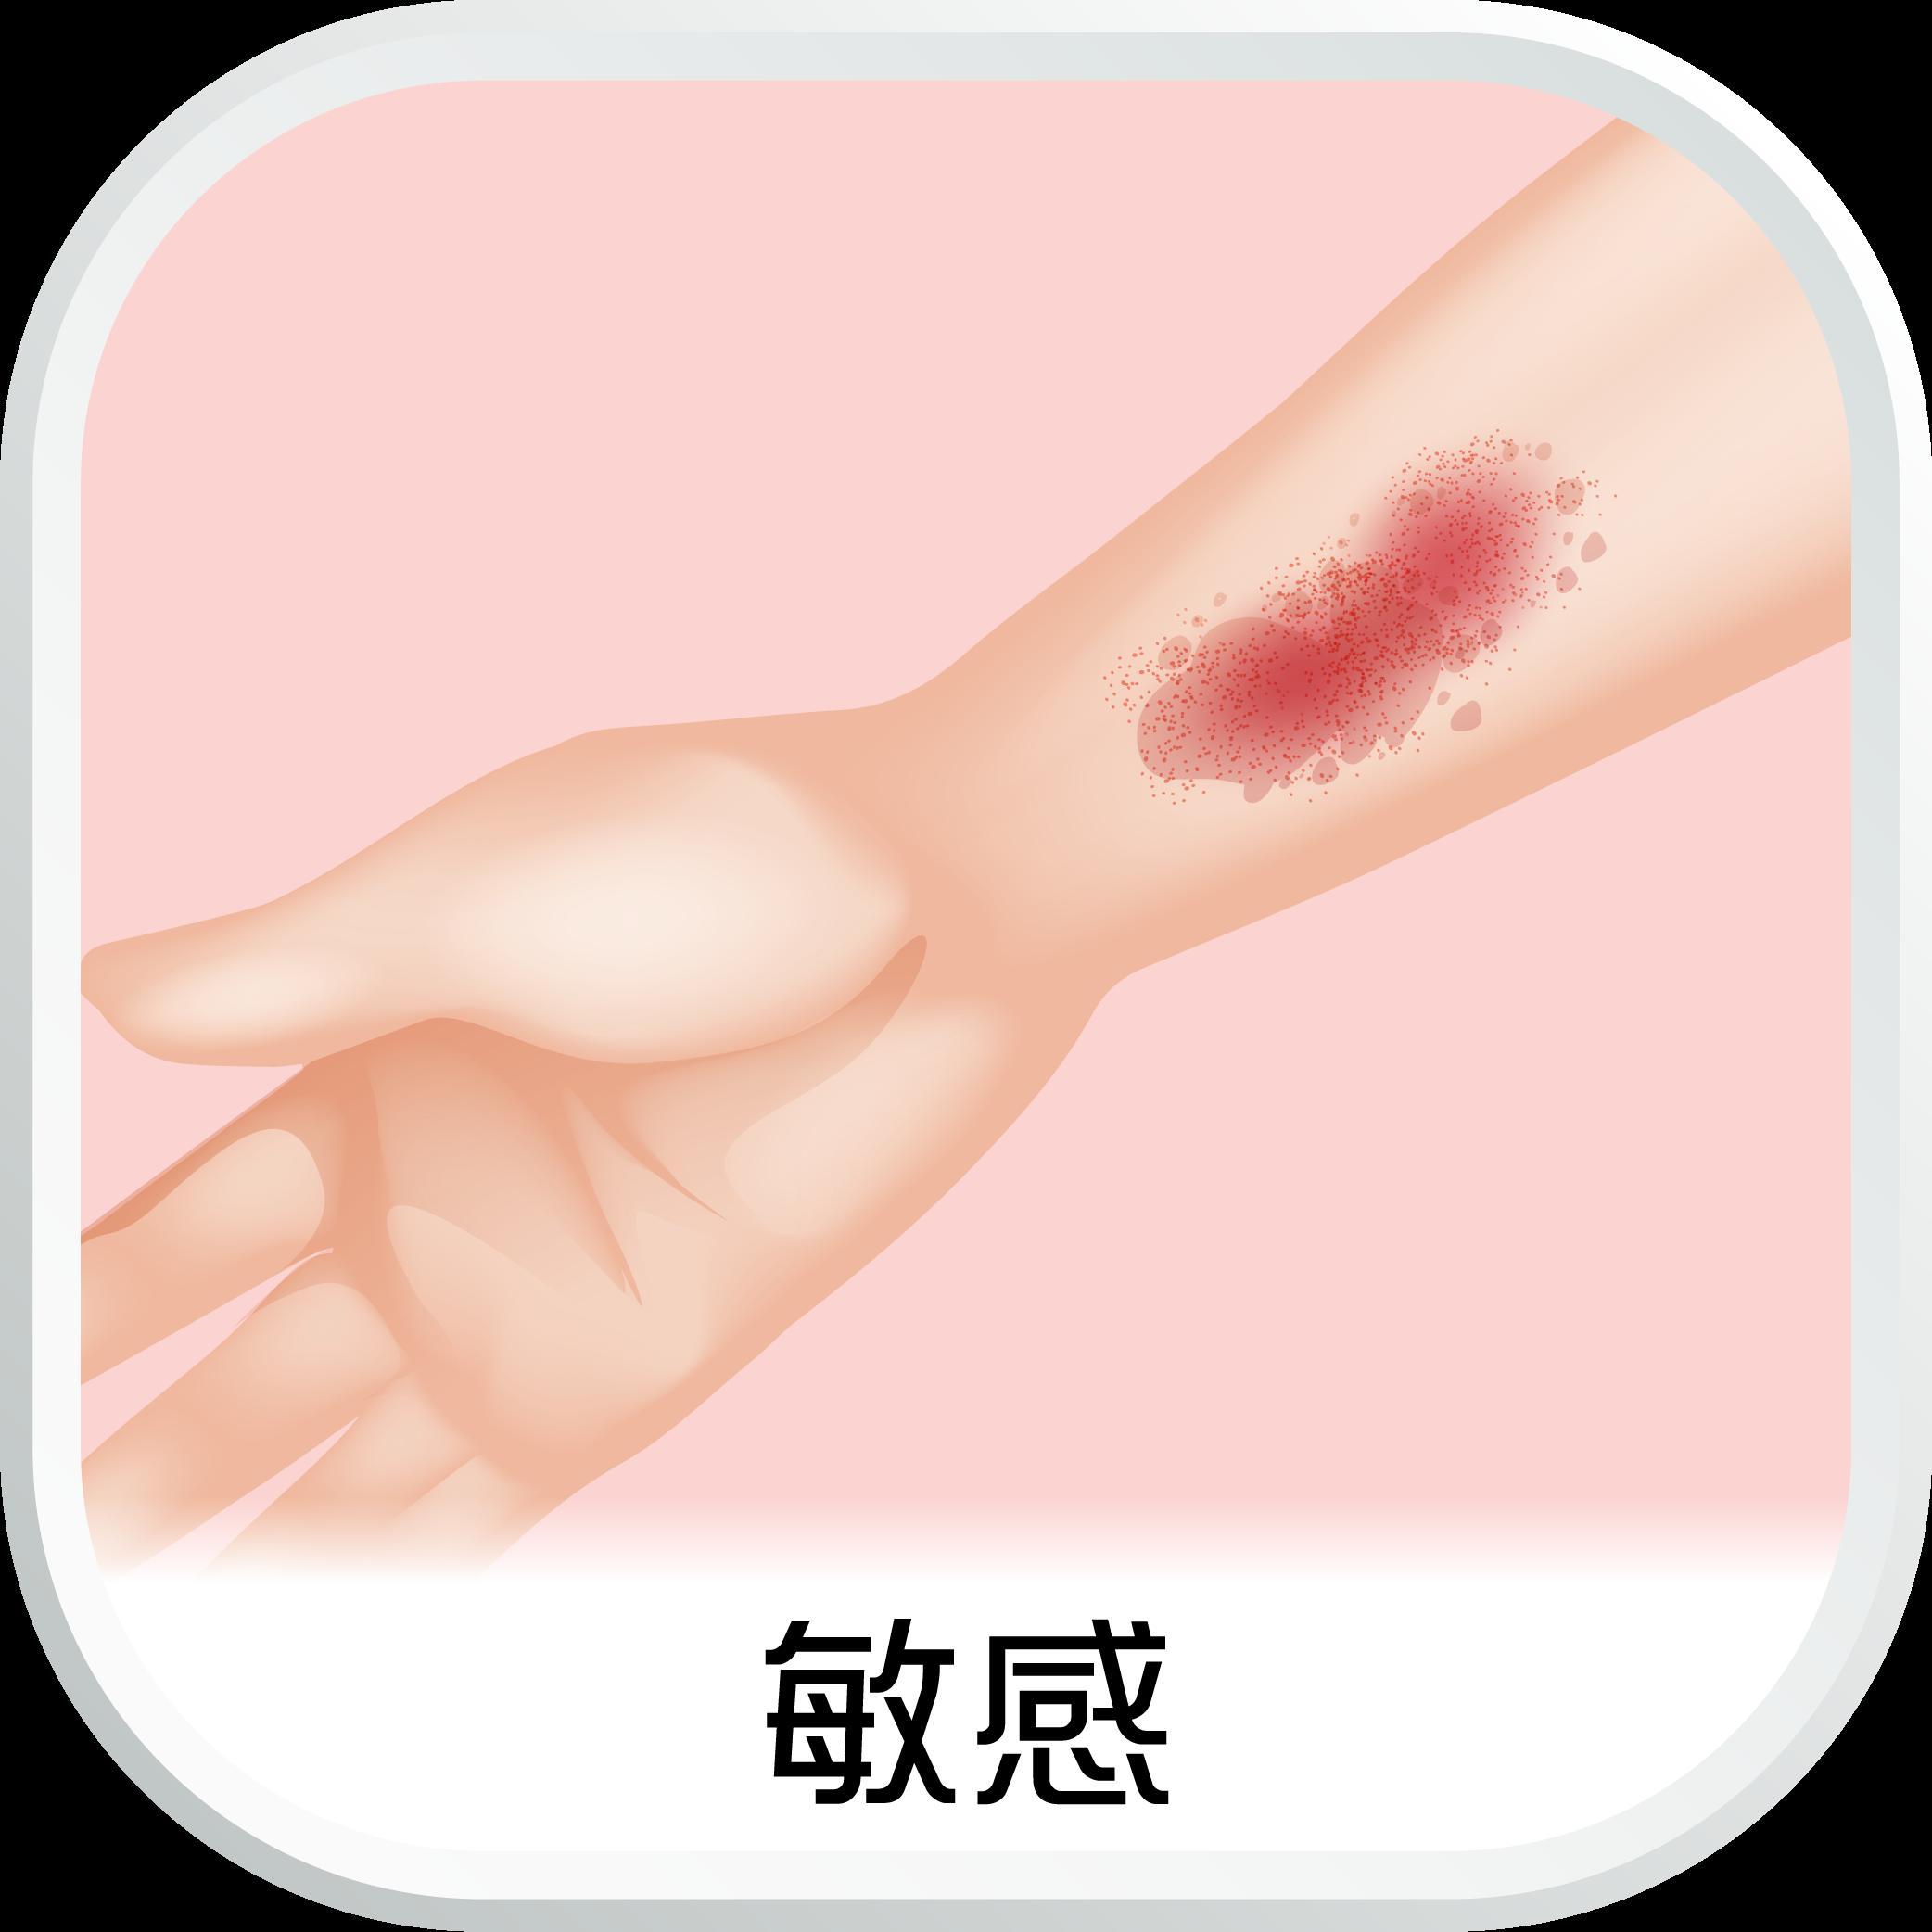 EHC_SubCat_aw_敏感